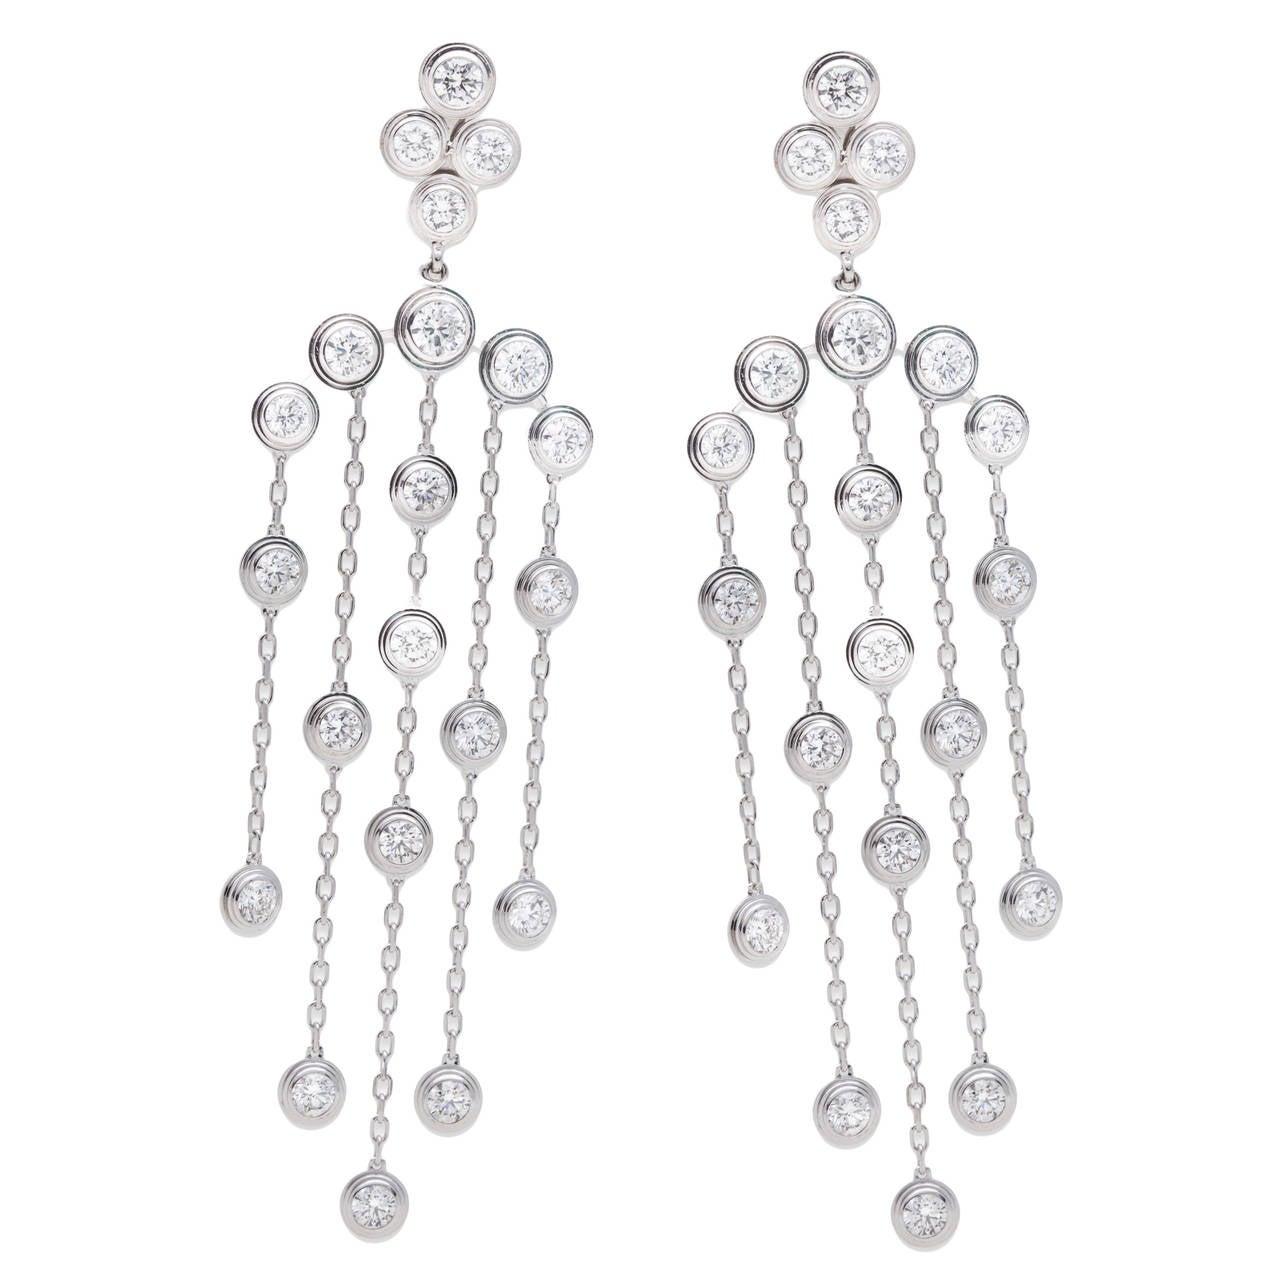 Cartier Diamants Legers De Cartier Earrings